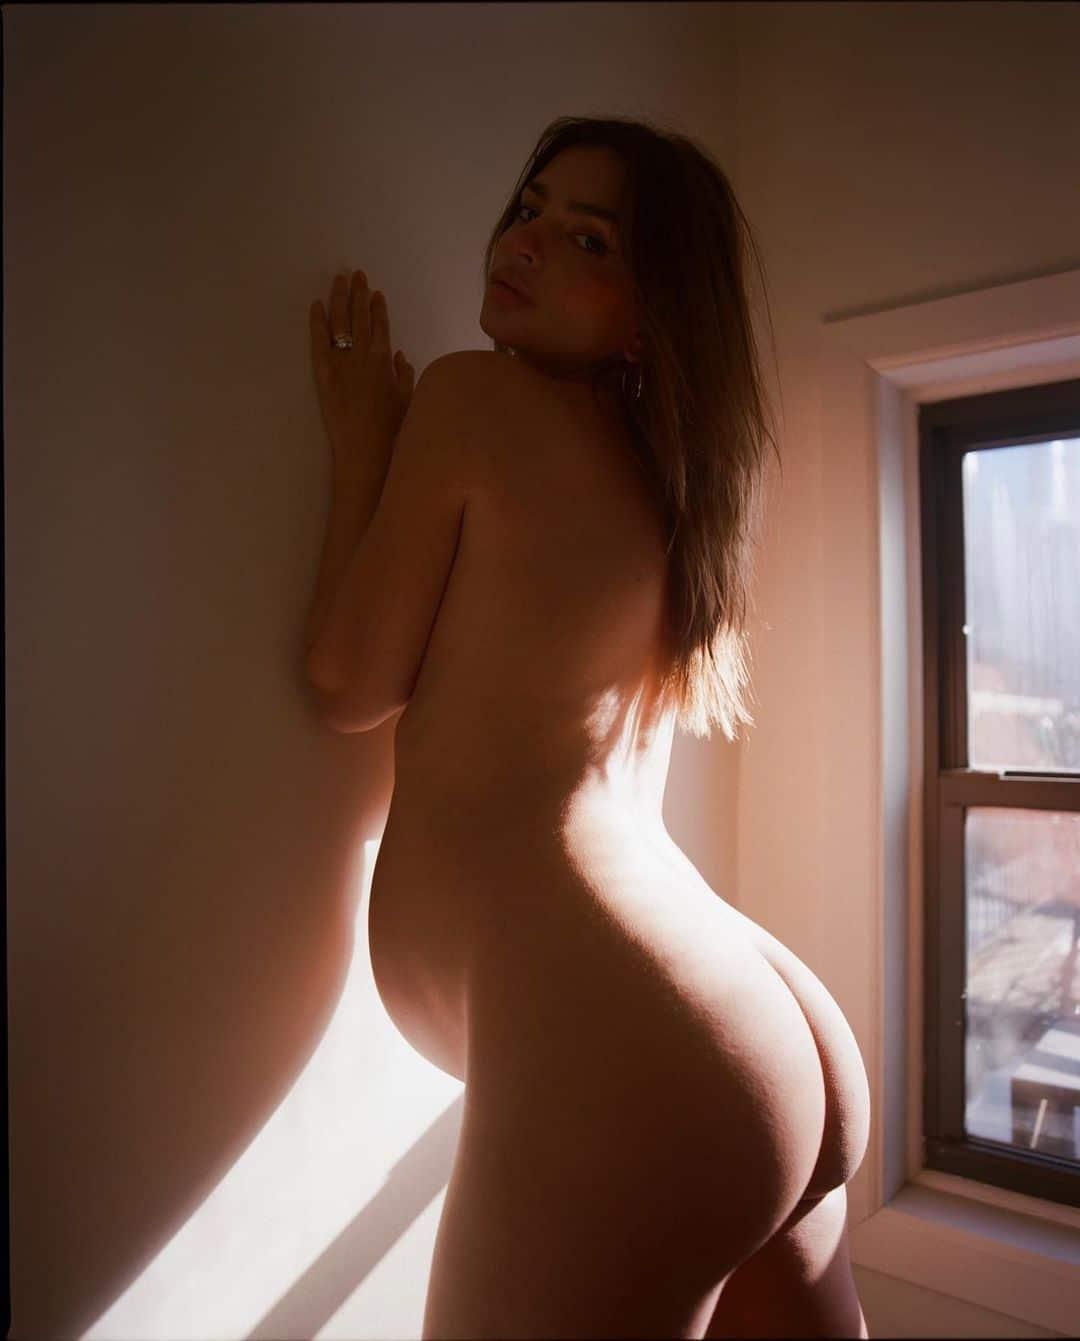 Emily Ratajkowski Nude Pregnant in Window